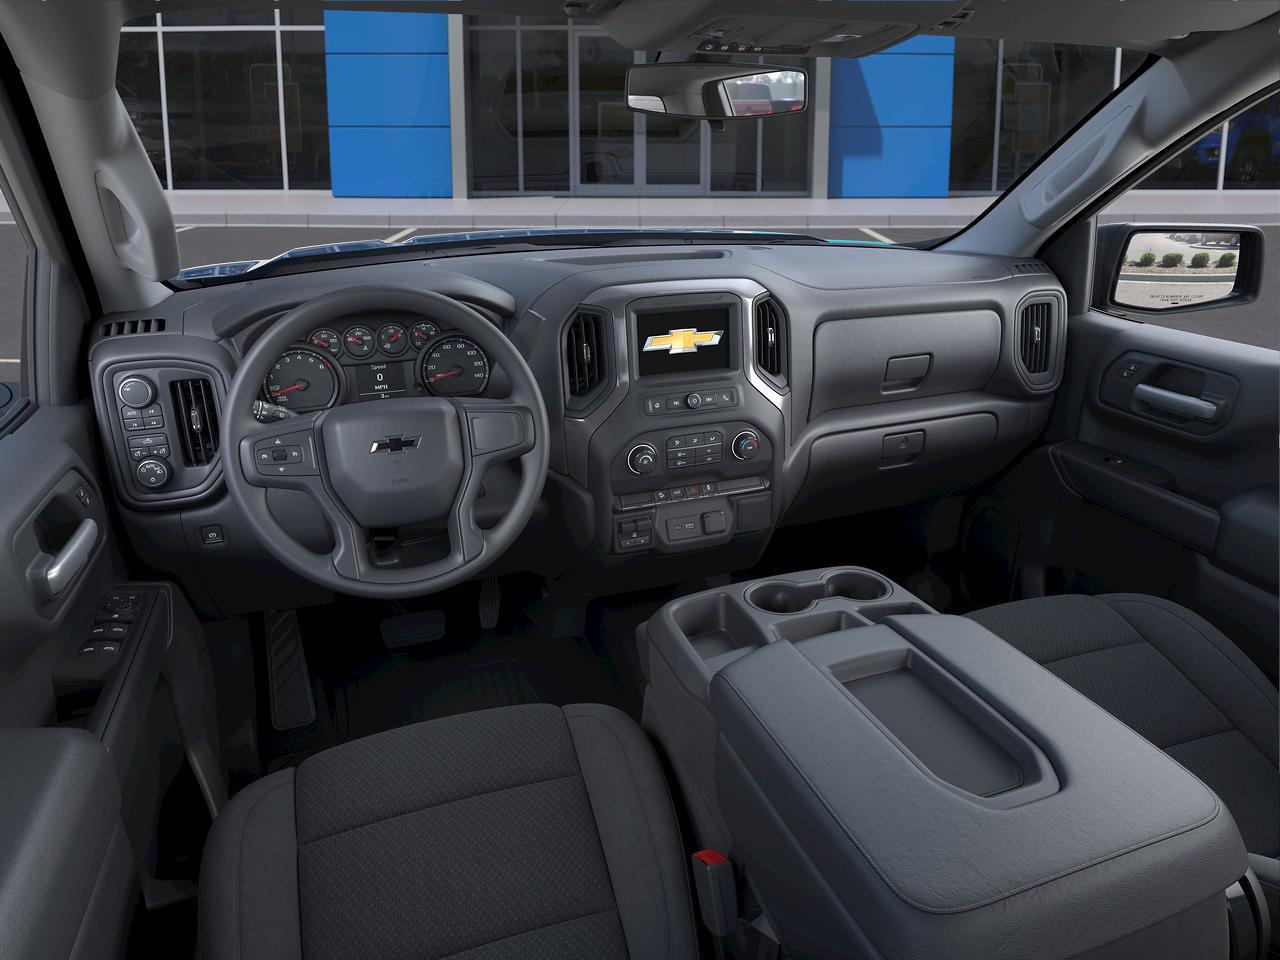 2021 Chevrolet Silverado 1500 Crew Cab 4x4, Pickup #Q210473 - photo 12